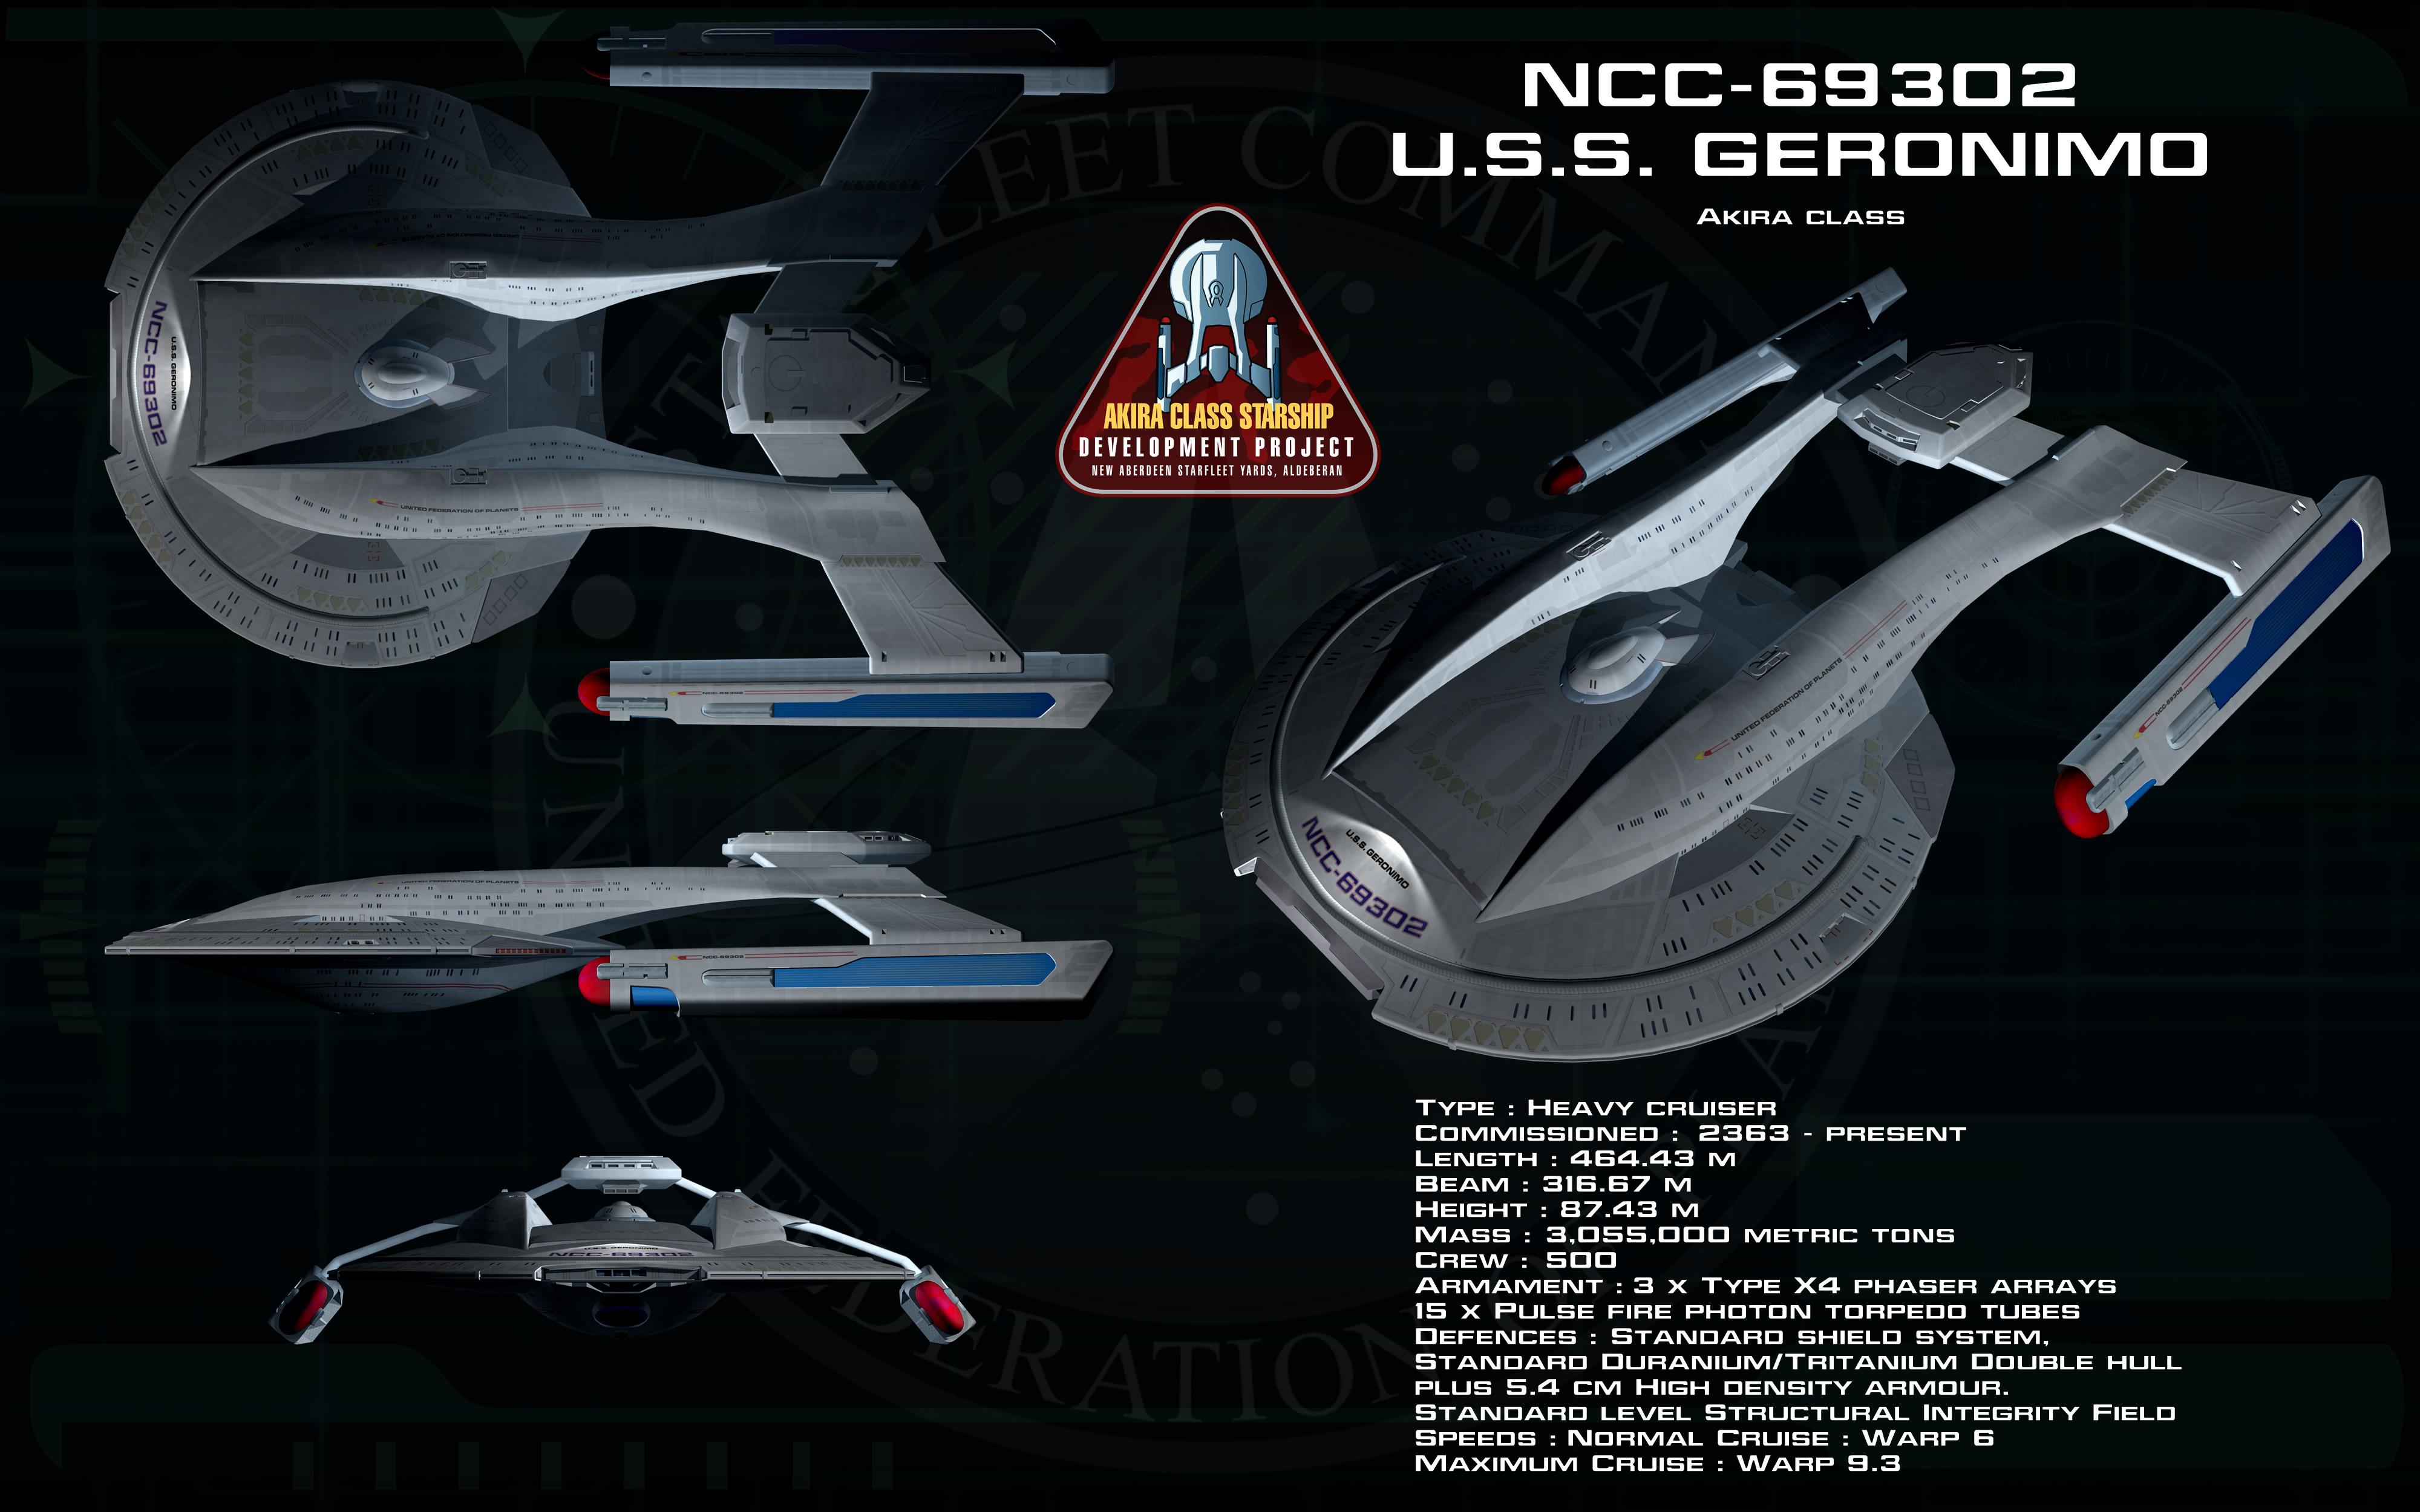 akira_cl_ortho___uss_geronimo_by_unusualsuspex-d6tedf4 Uss Defiant Schematics on uss prometheus, delta flyer schematics, uss reliant schematics, uss voyager, uss yamaguchi, deep space nine schematics, uss vengeance star trek, runabout schematics, uss reliant deck plans, uss titan schematics, uss excalibur, uss excelsior, star trek ship schematics, millennium falcon schematics, uss lst schematic, uss equinox, space station schematics, uss valiant schematics, uss diligent, uss enterprise,